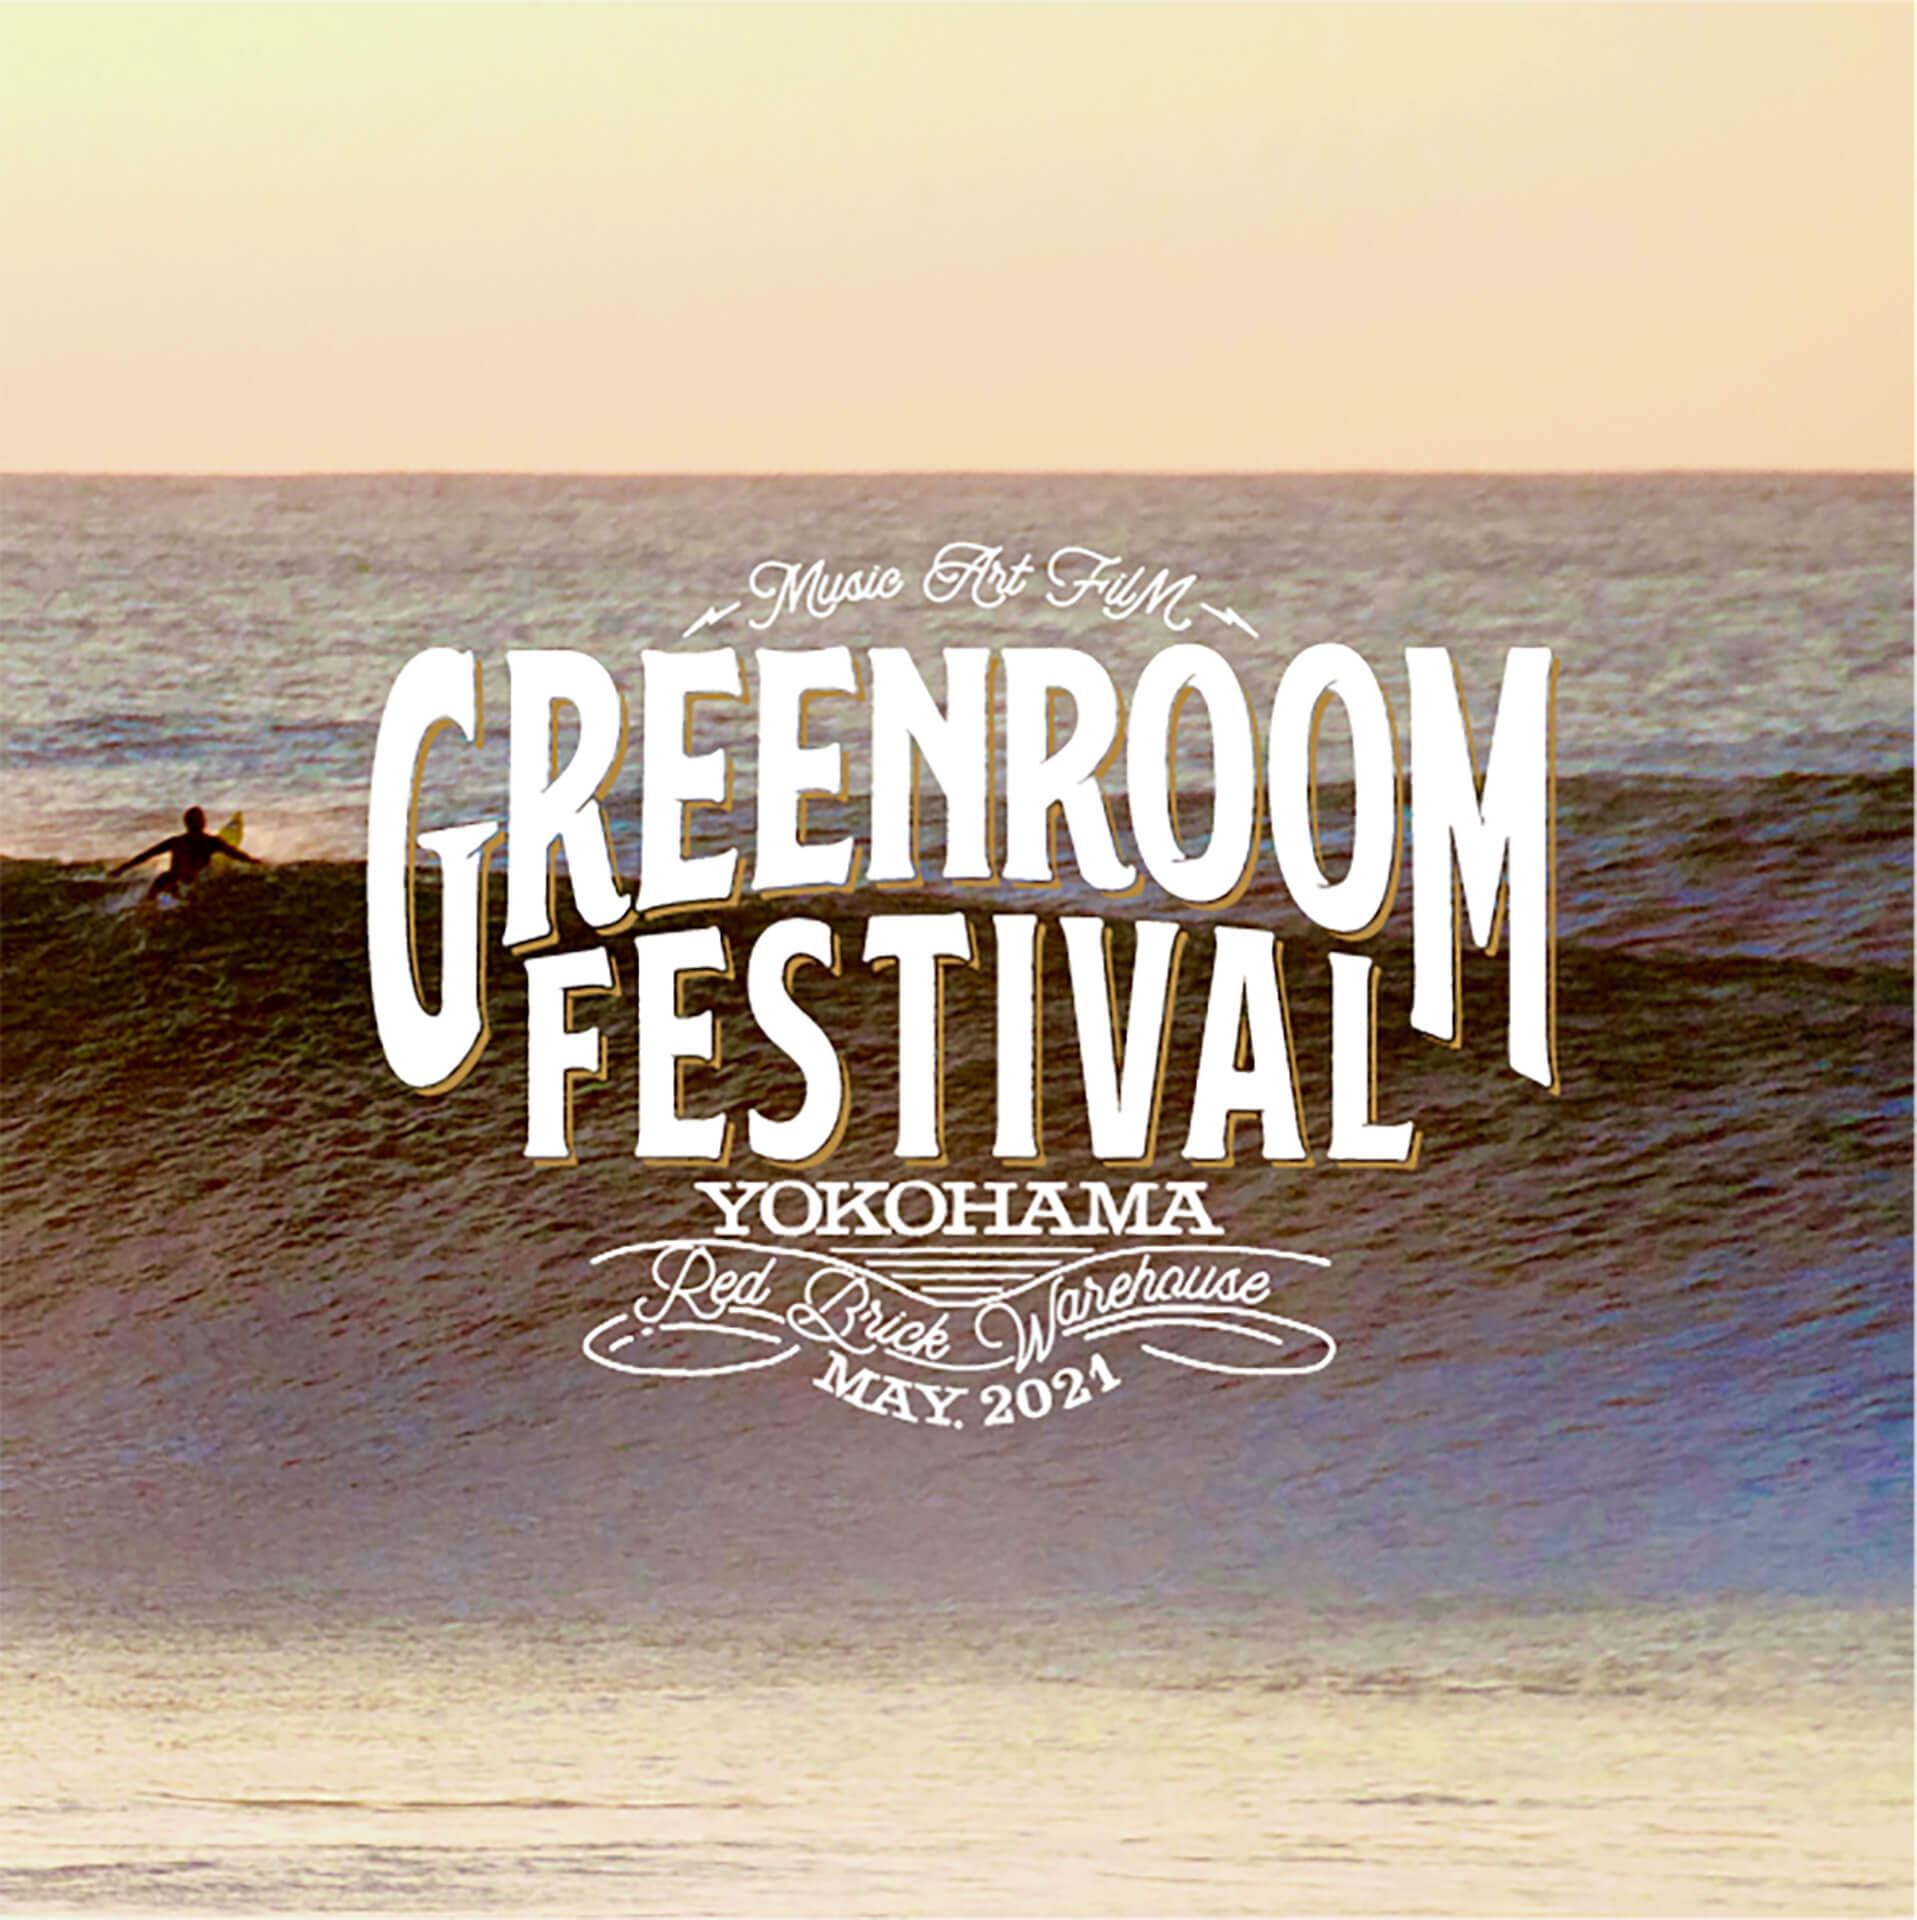 <GREENROOM FESTIVAL'21>ART AREA出展アーティストが発表!Yusuke Hanai、Koji Toyodaら計16組 music210413_greenroomfestival-210413_6